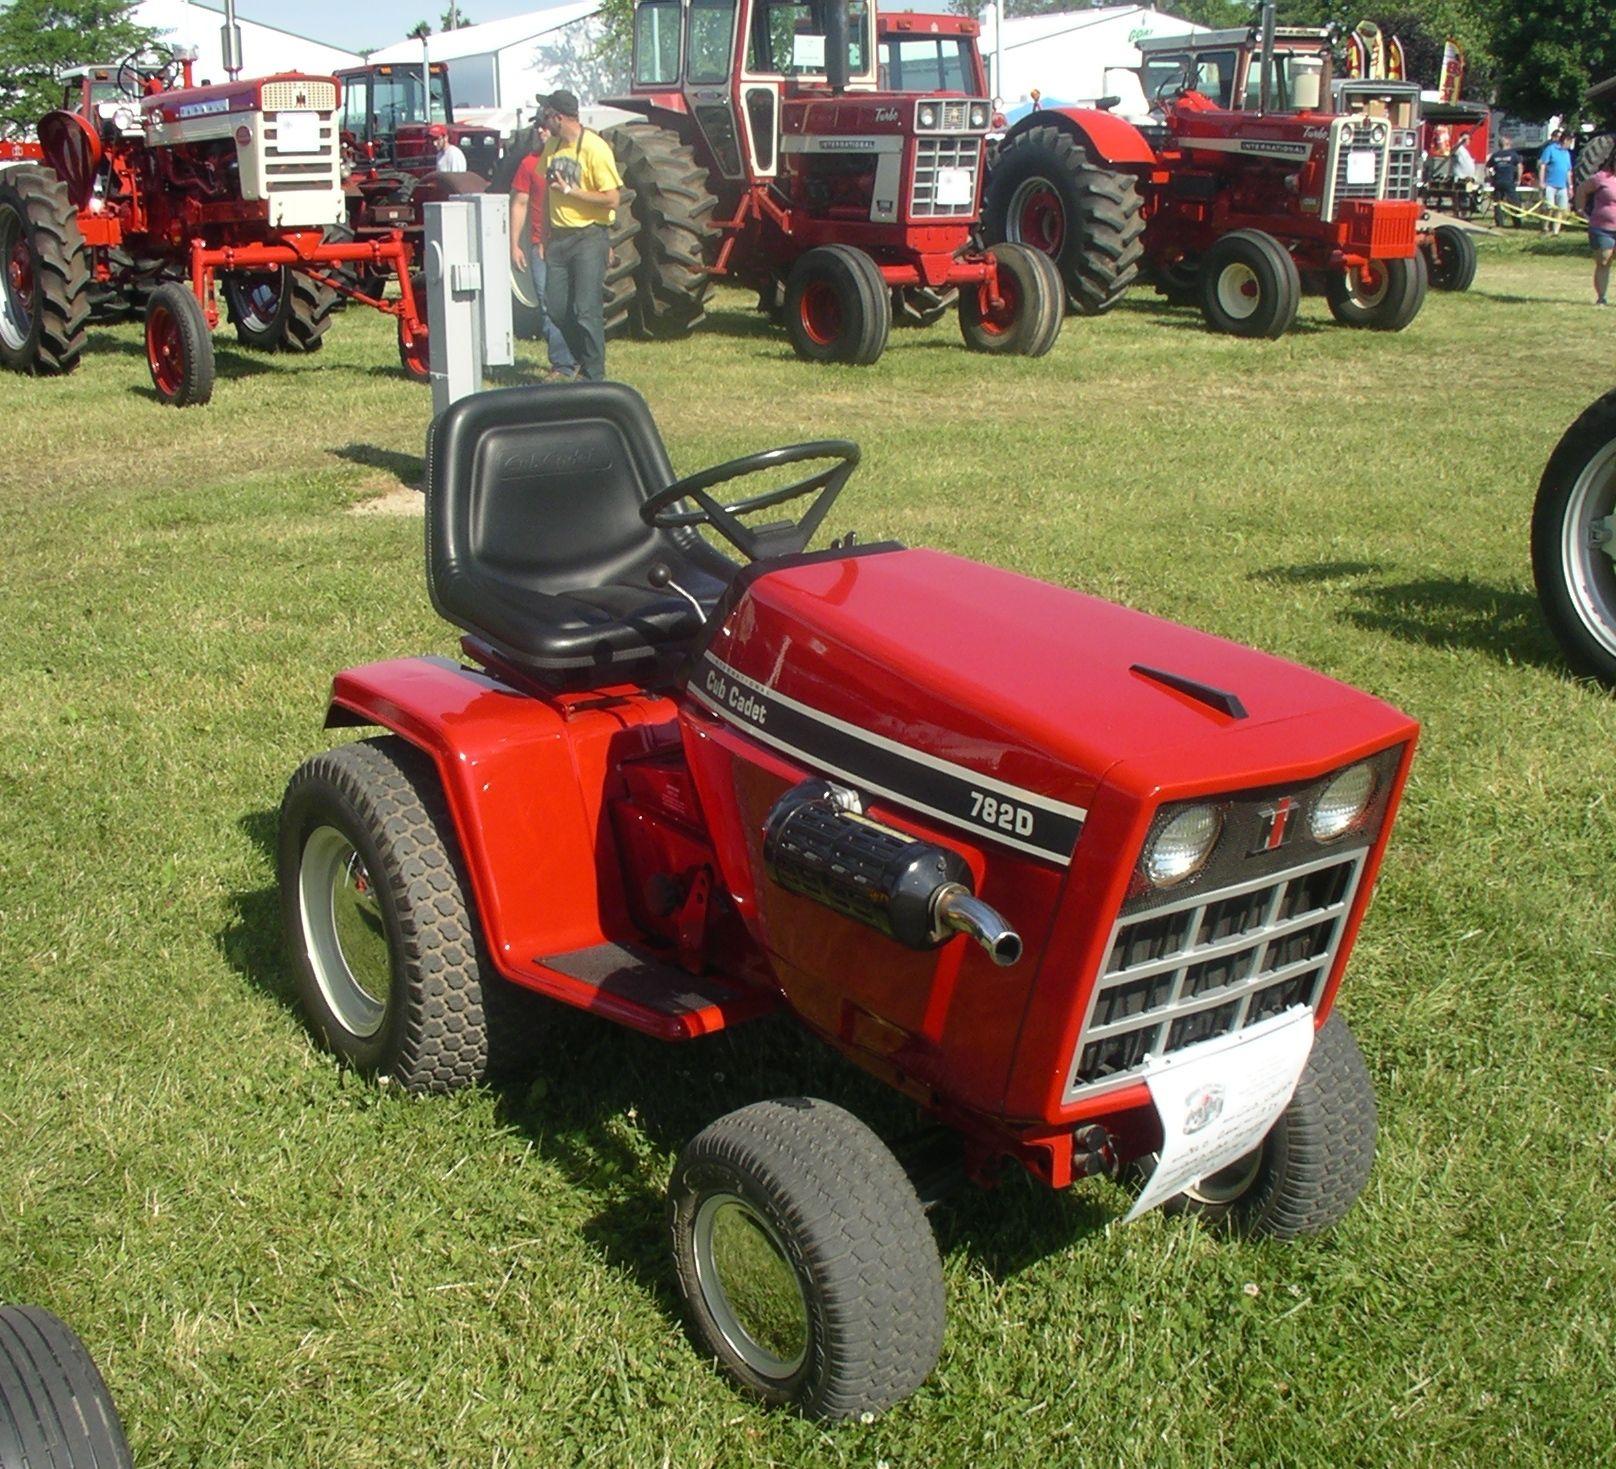 Red Cub Cadet Tractors : Cub cadet red power round up pinterest